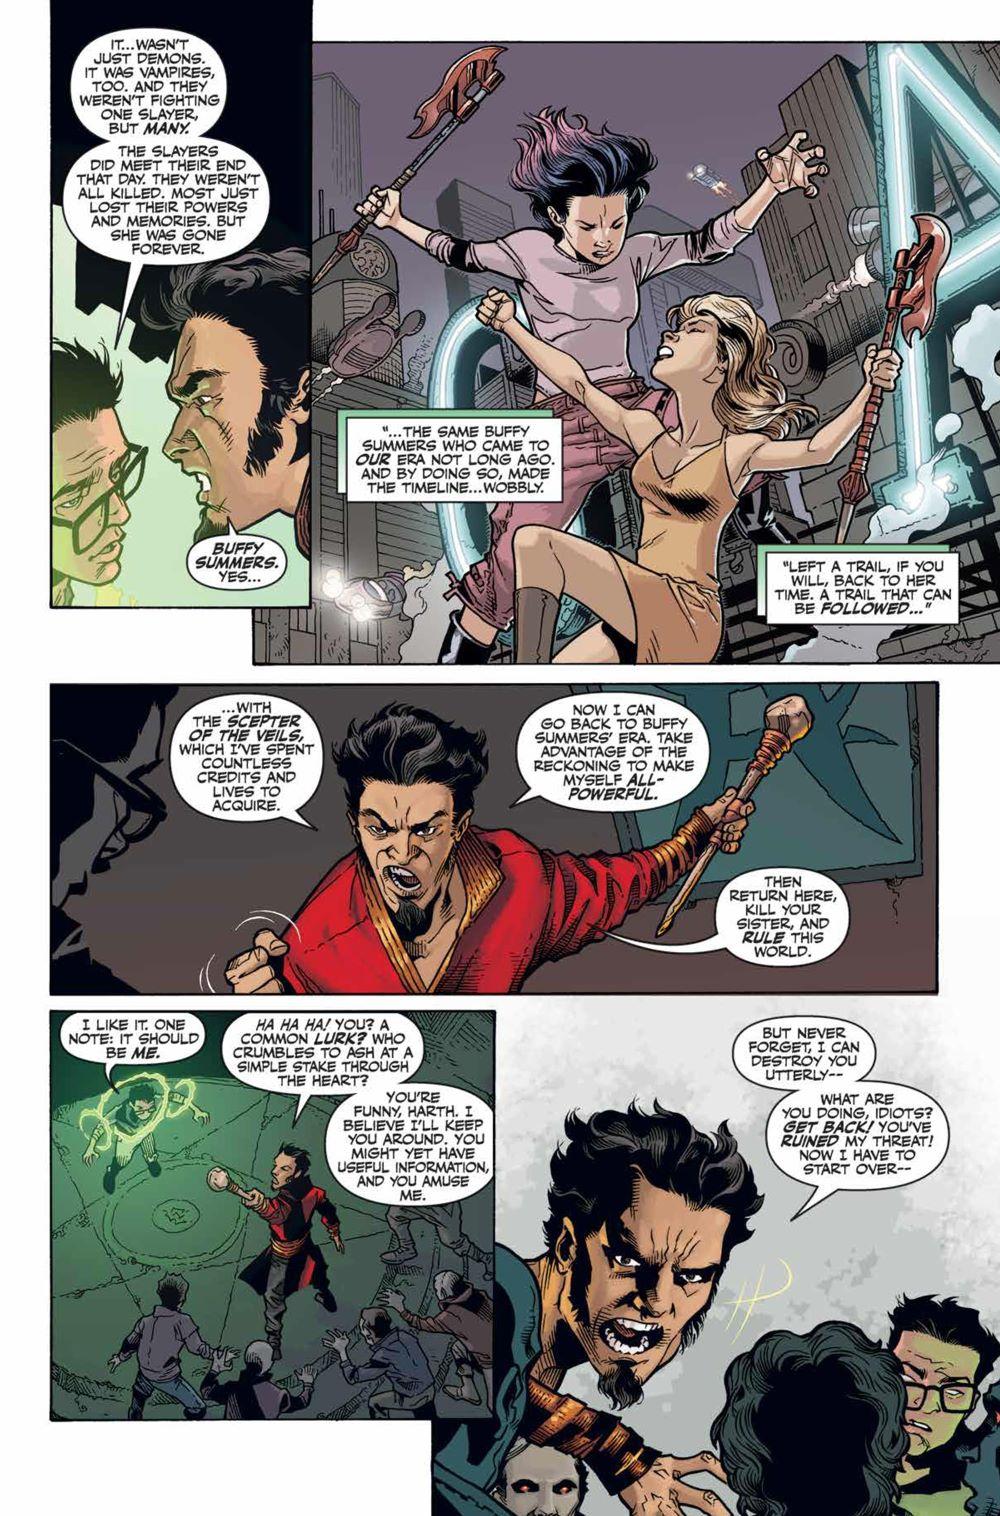 Buffy_Season12_HC_PRESS_112 ComicList Previews: BUFFY THE VAMPIRE SLAYER SEASON 12 LIBRARY EDITION VOLUME 1 HC